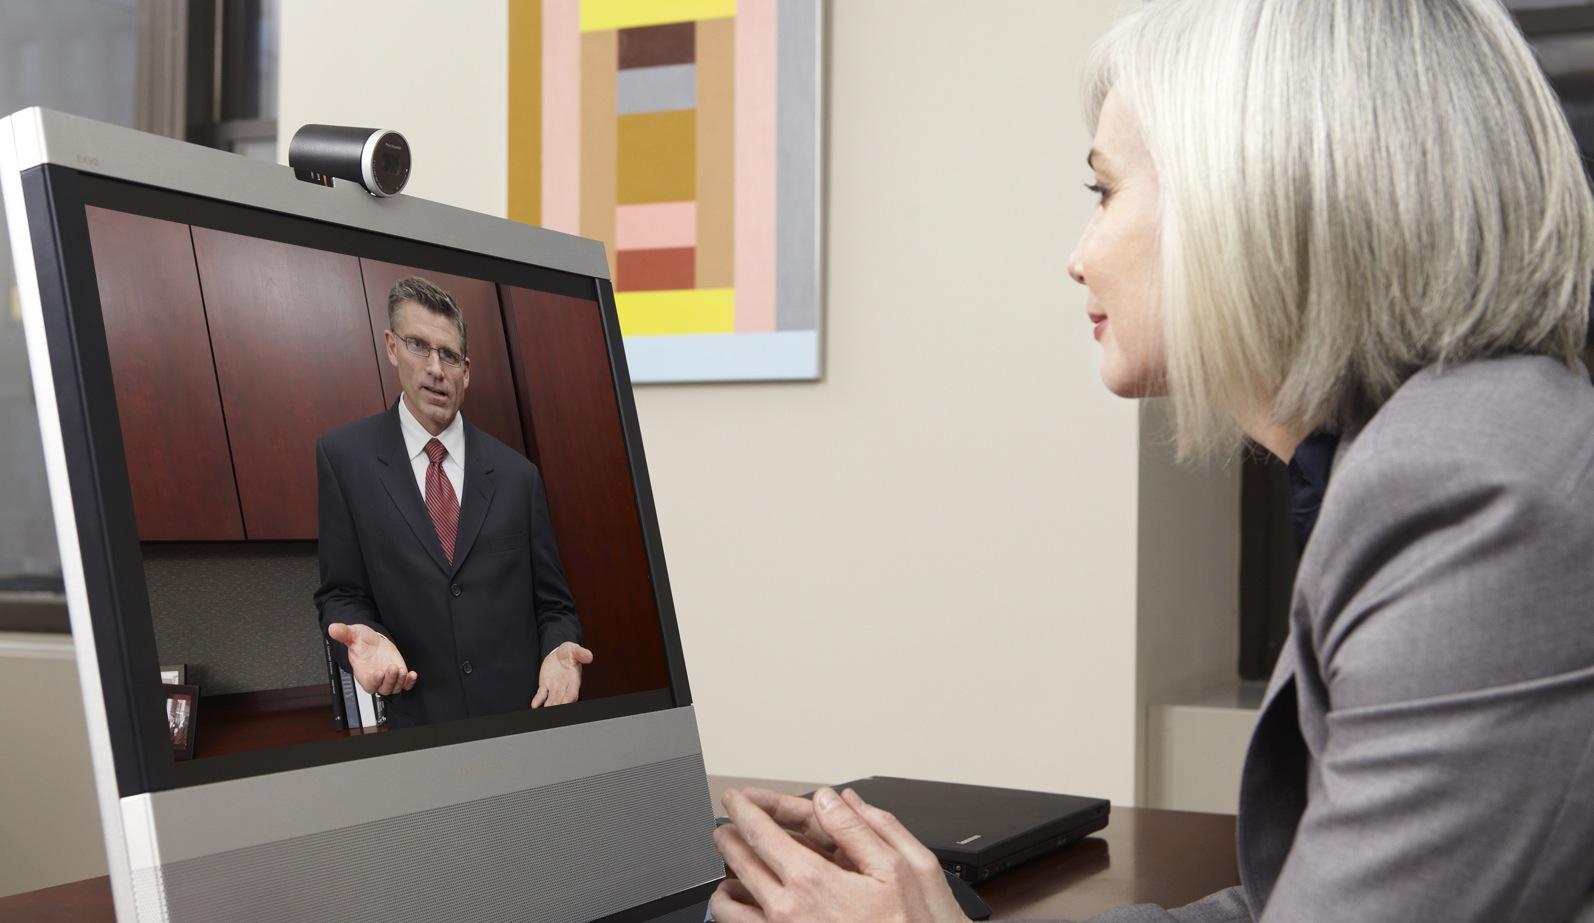 http://playtech.ro/wp-content/uploads/2010/09/TANDBERG-EX90-In-Use-4.jpg